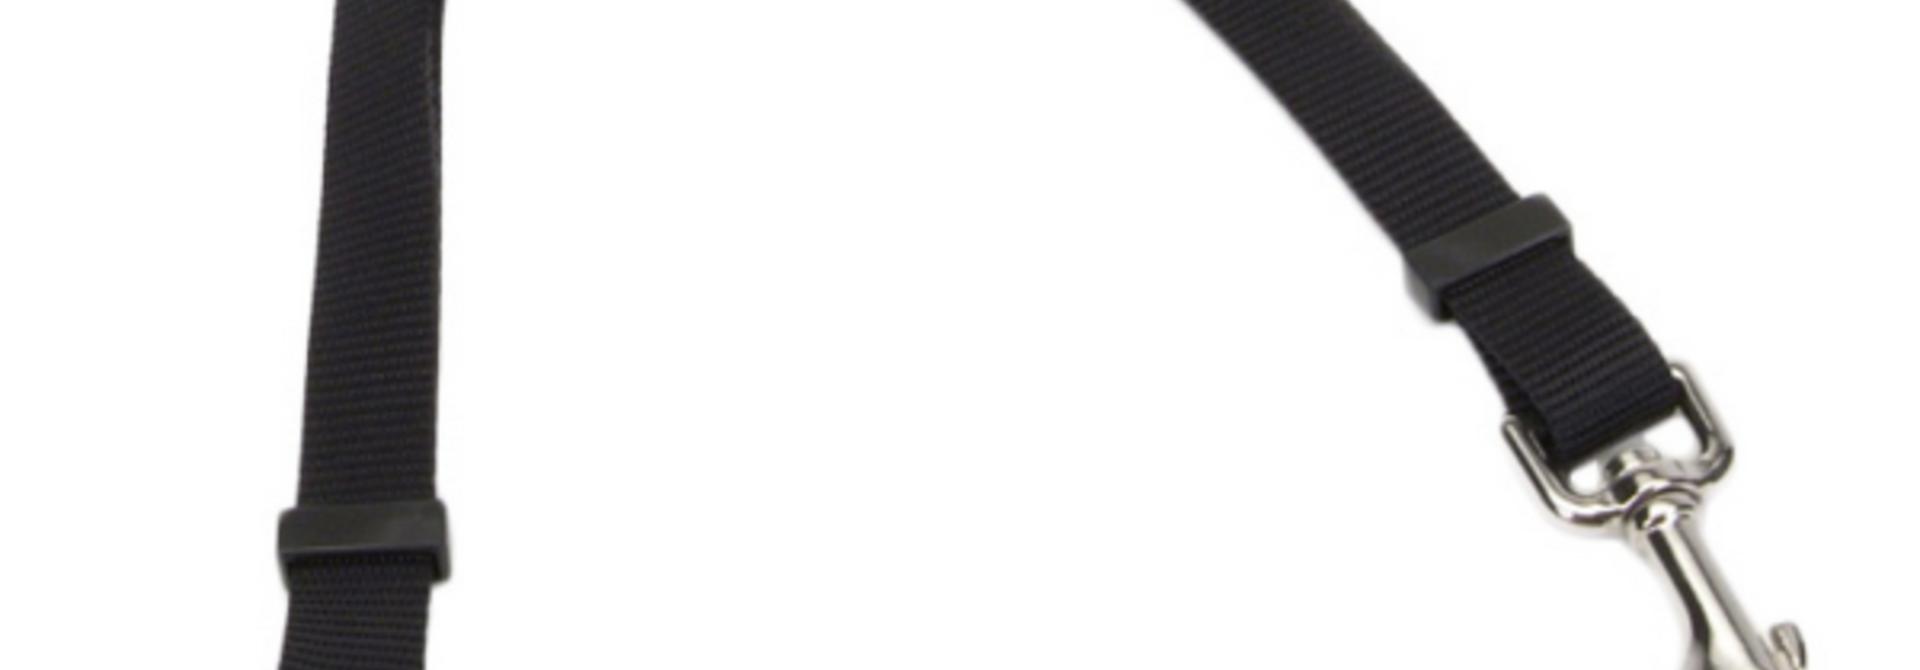 "2 Dog Adj Coupler 3/4x24-36"" Black"